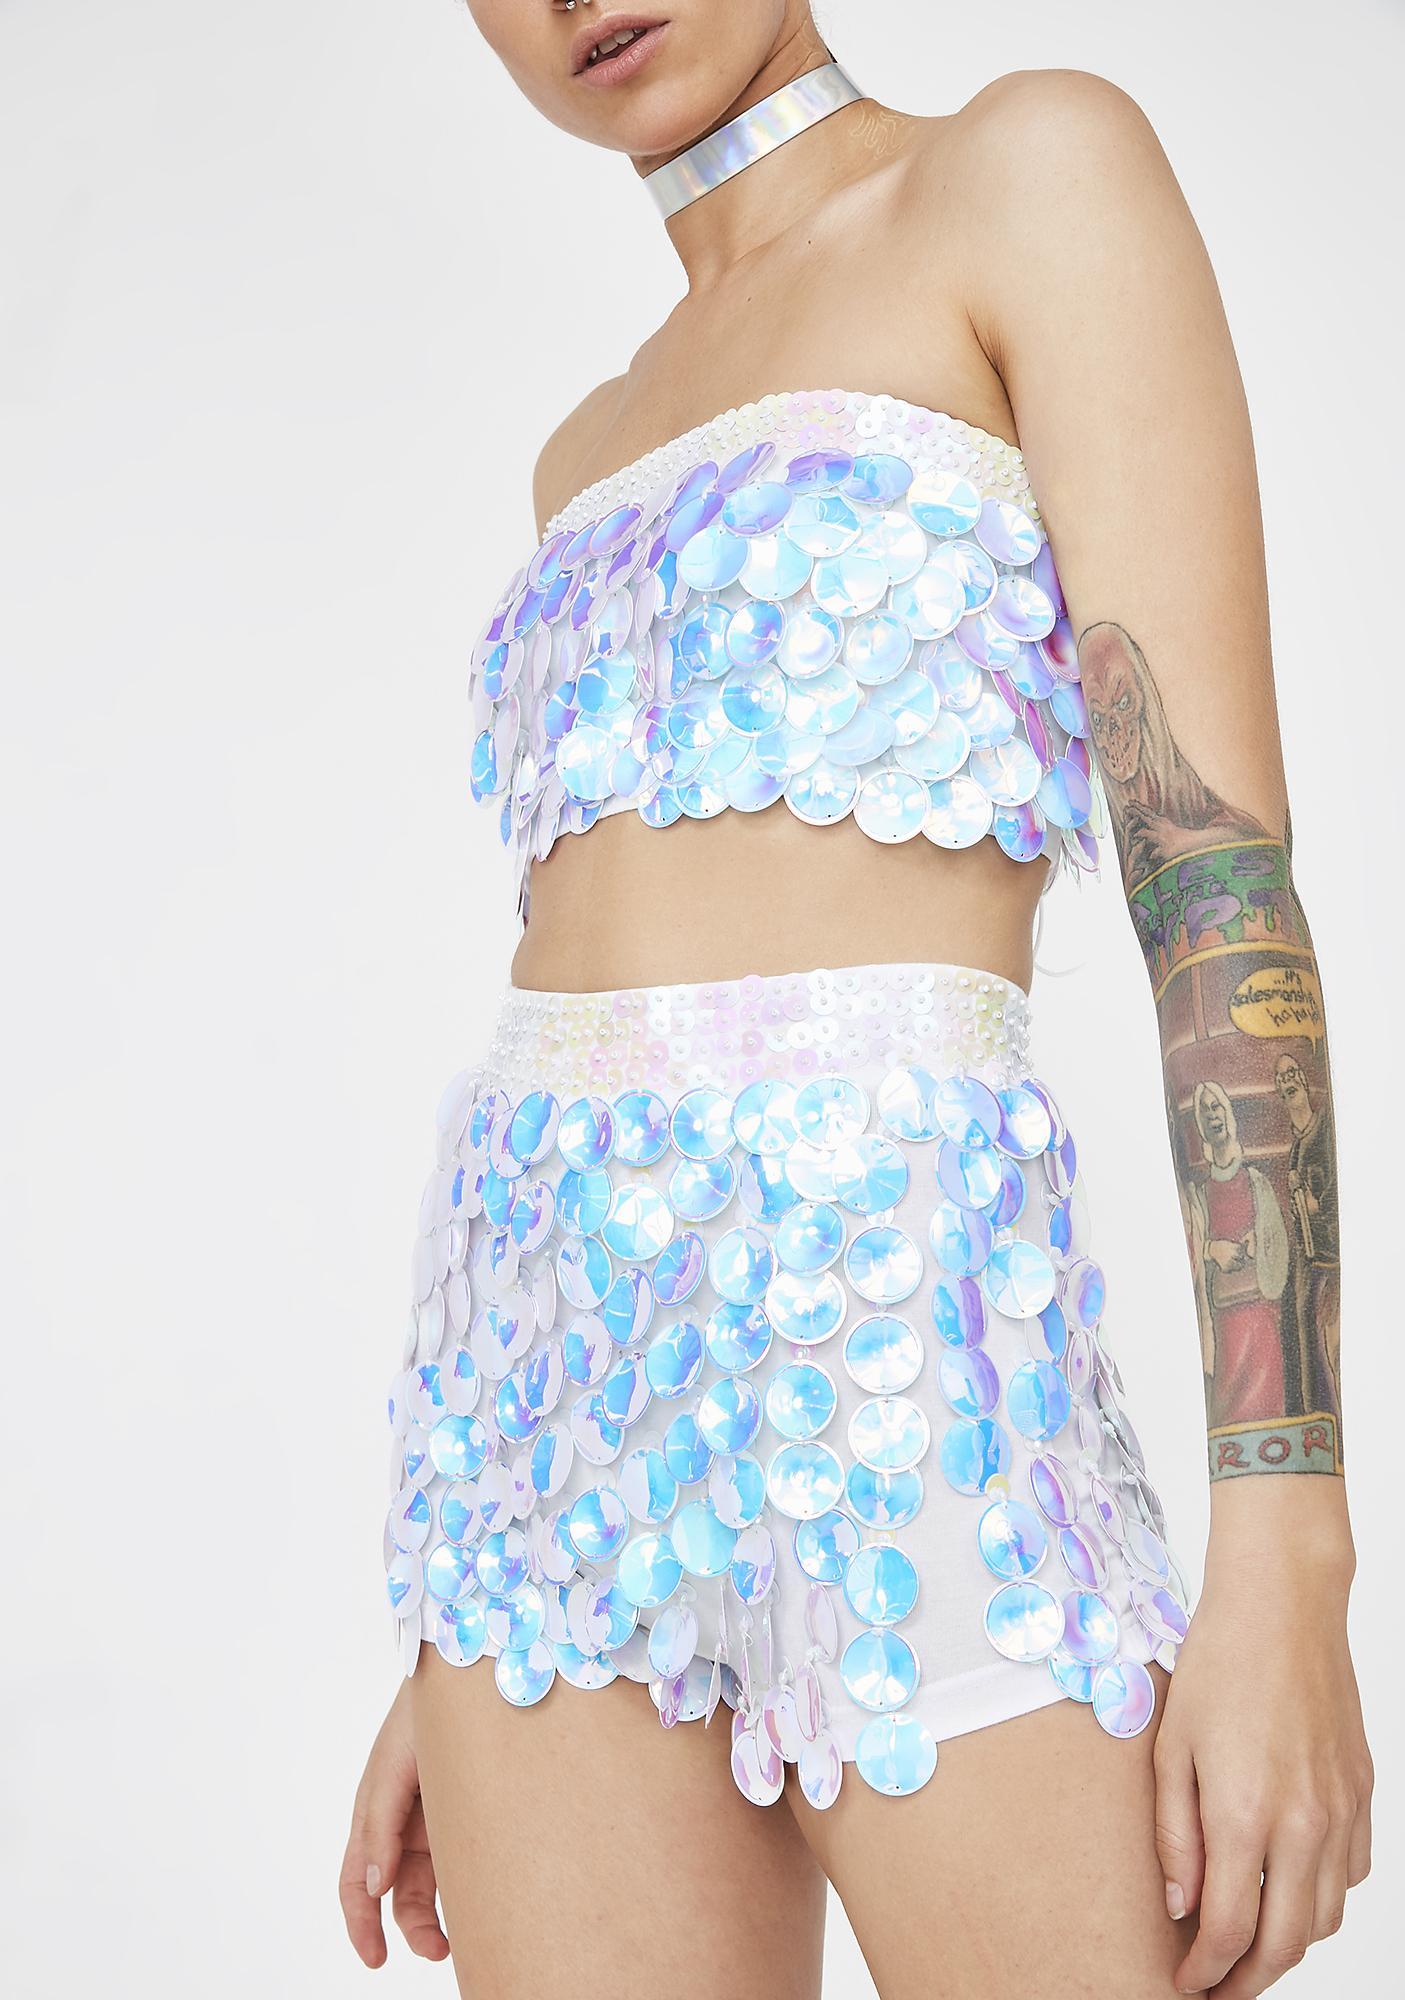 Magical Wonderland White Interstellar Shorts